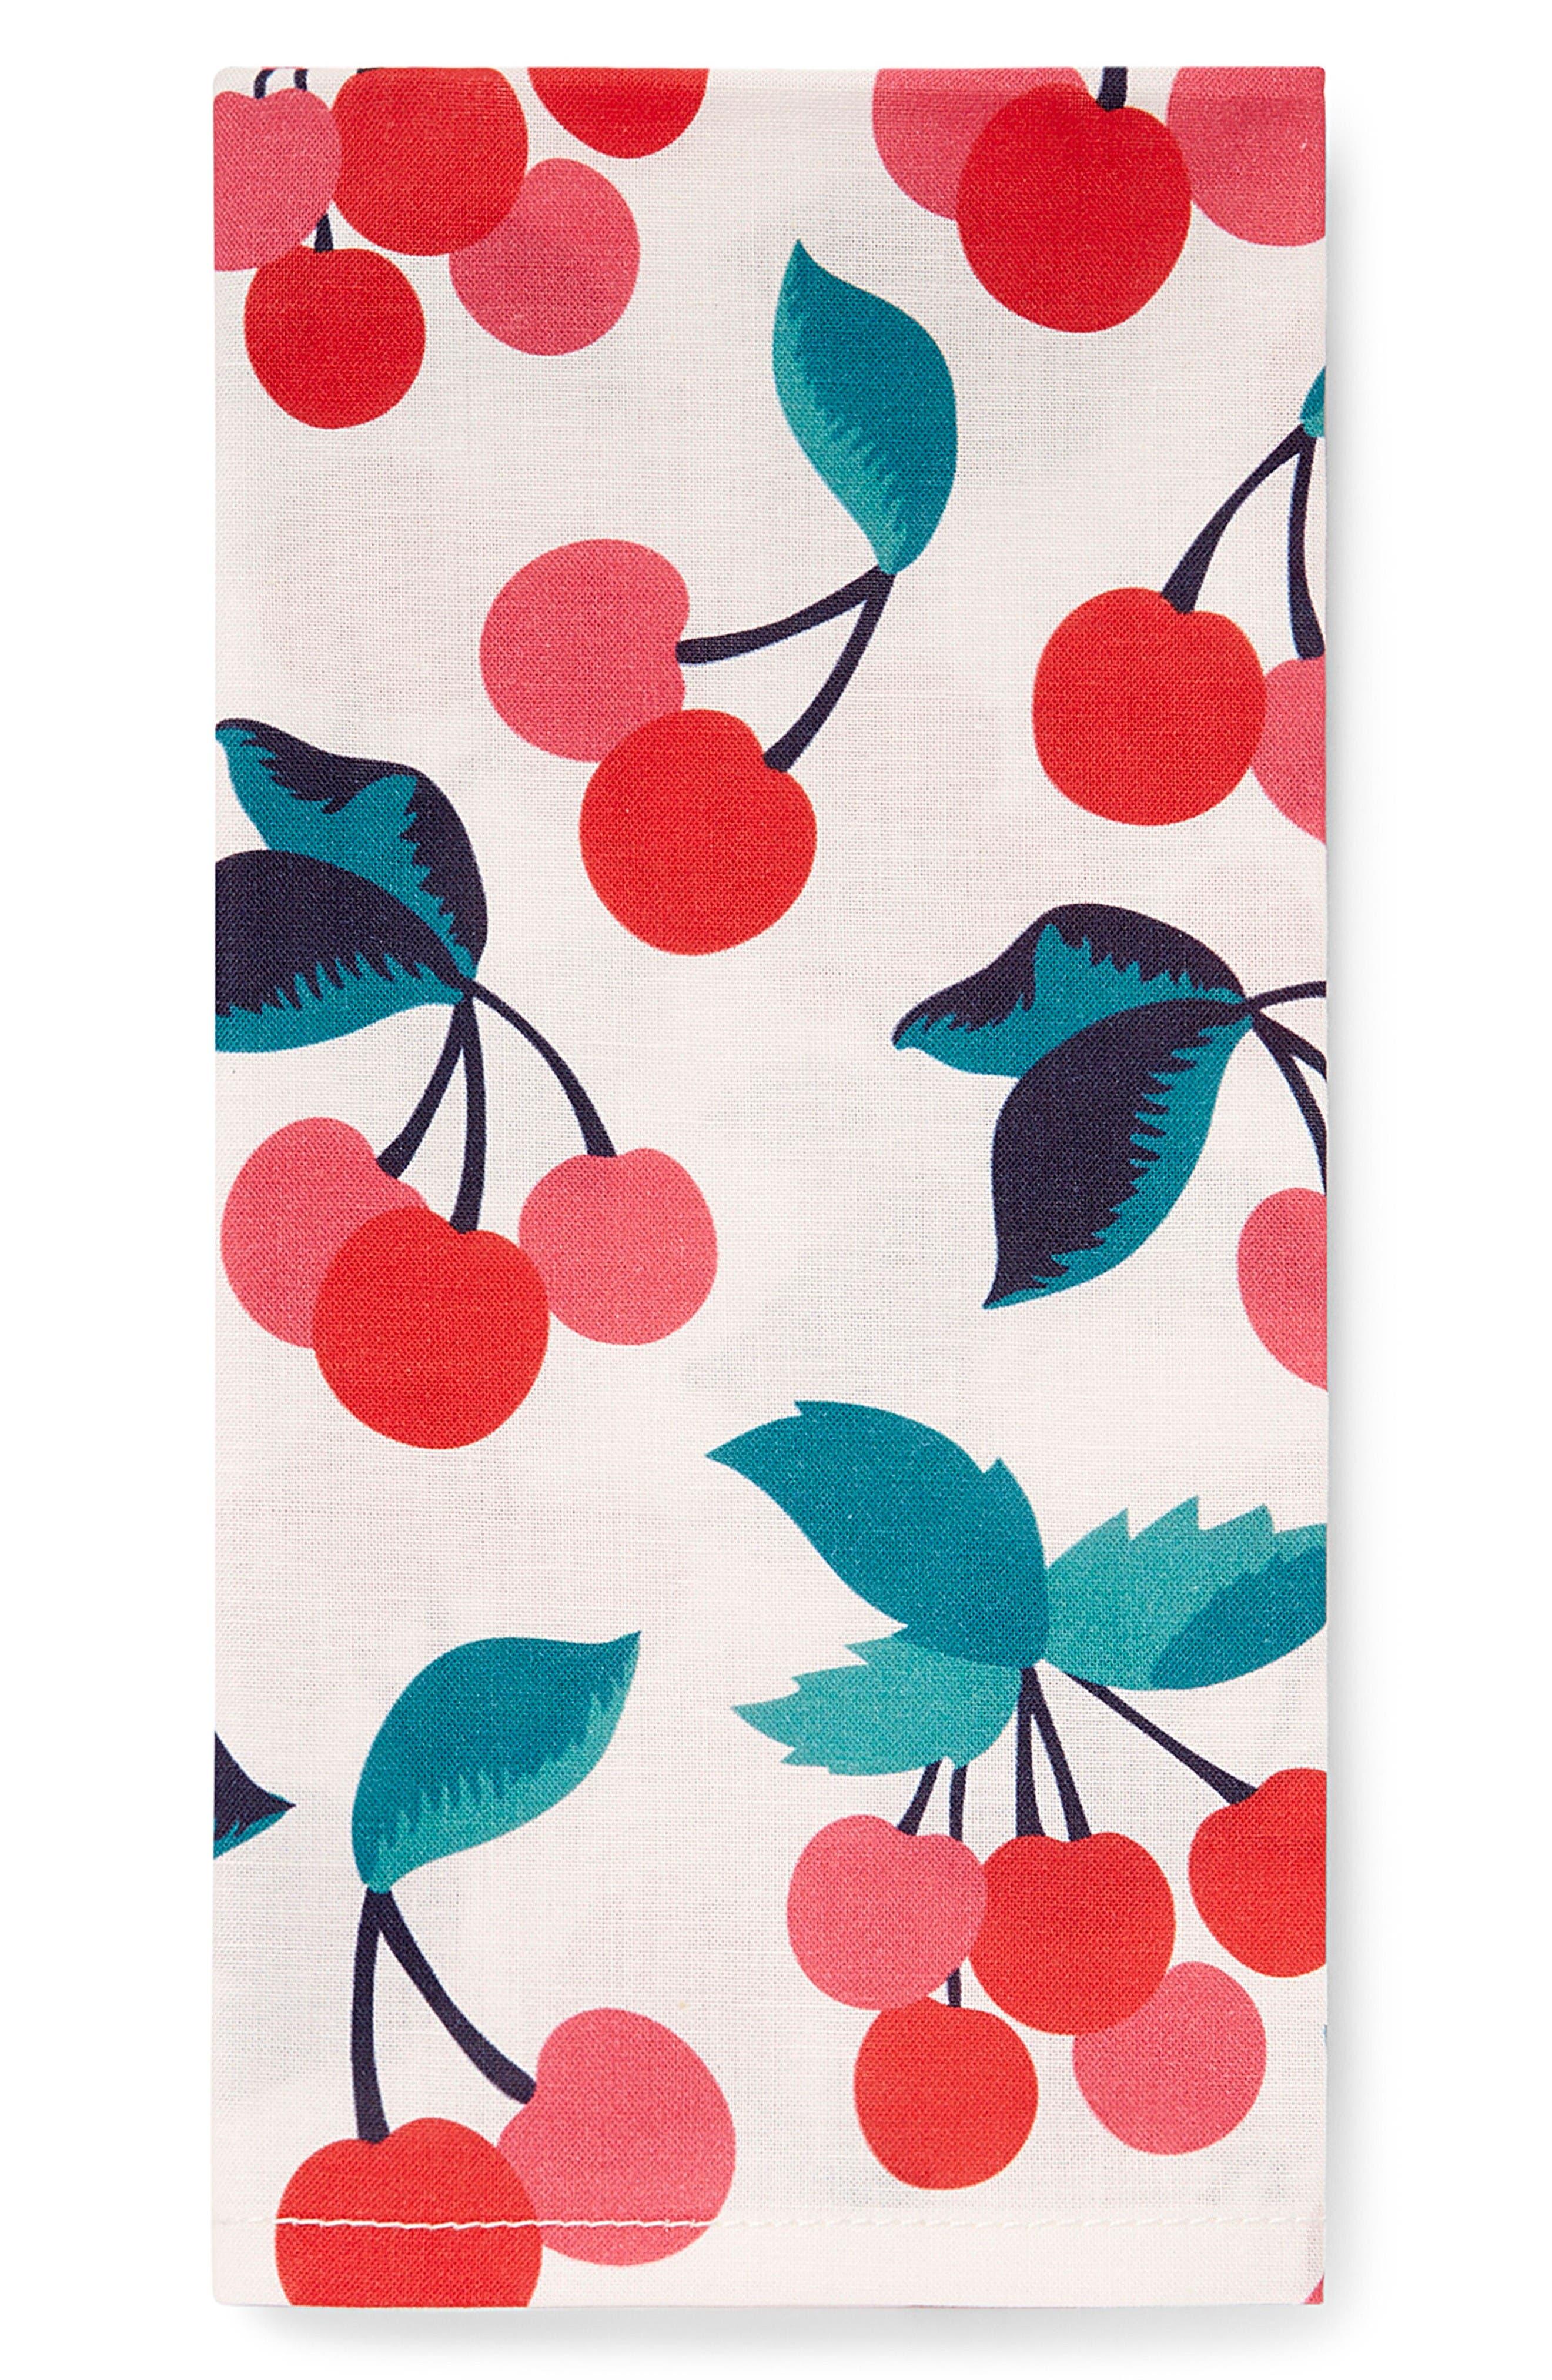 Main Image - Draper James Set of 4 Cherry Print Cloth Napkins